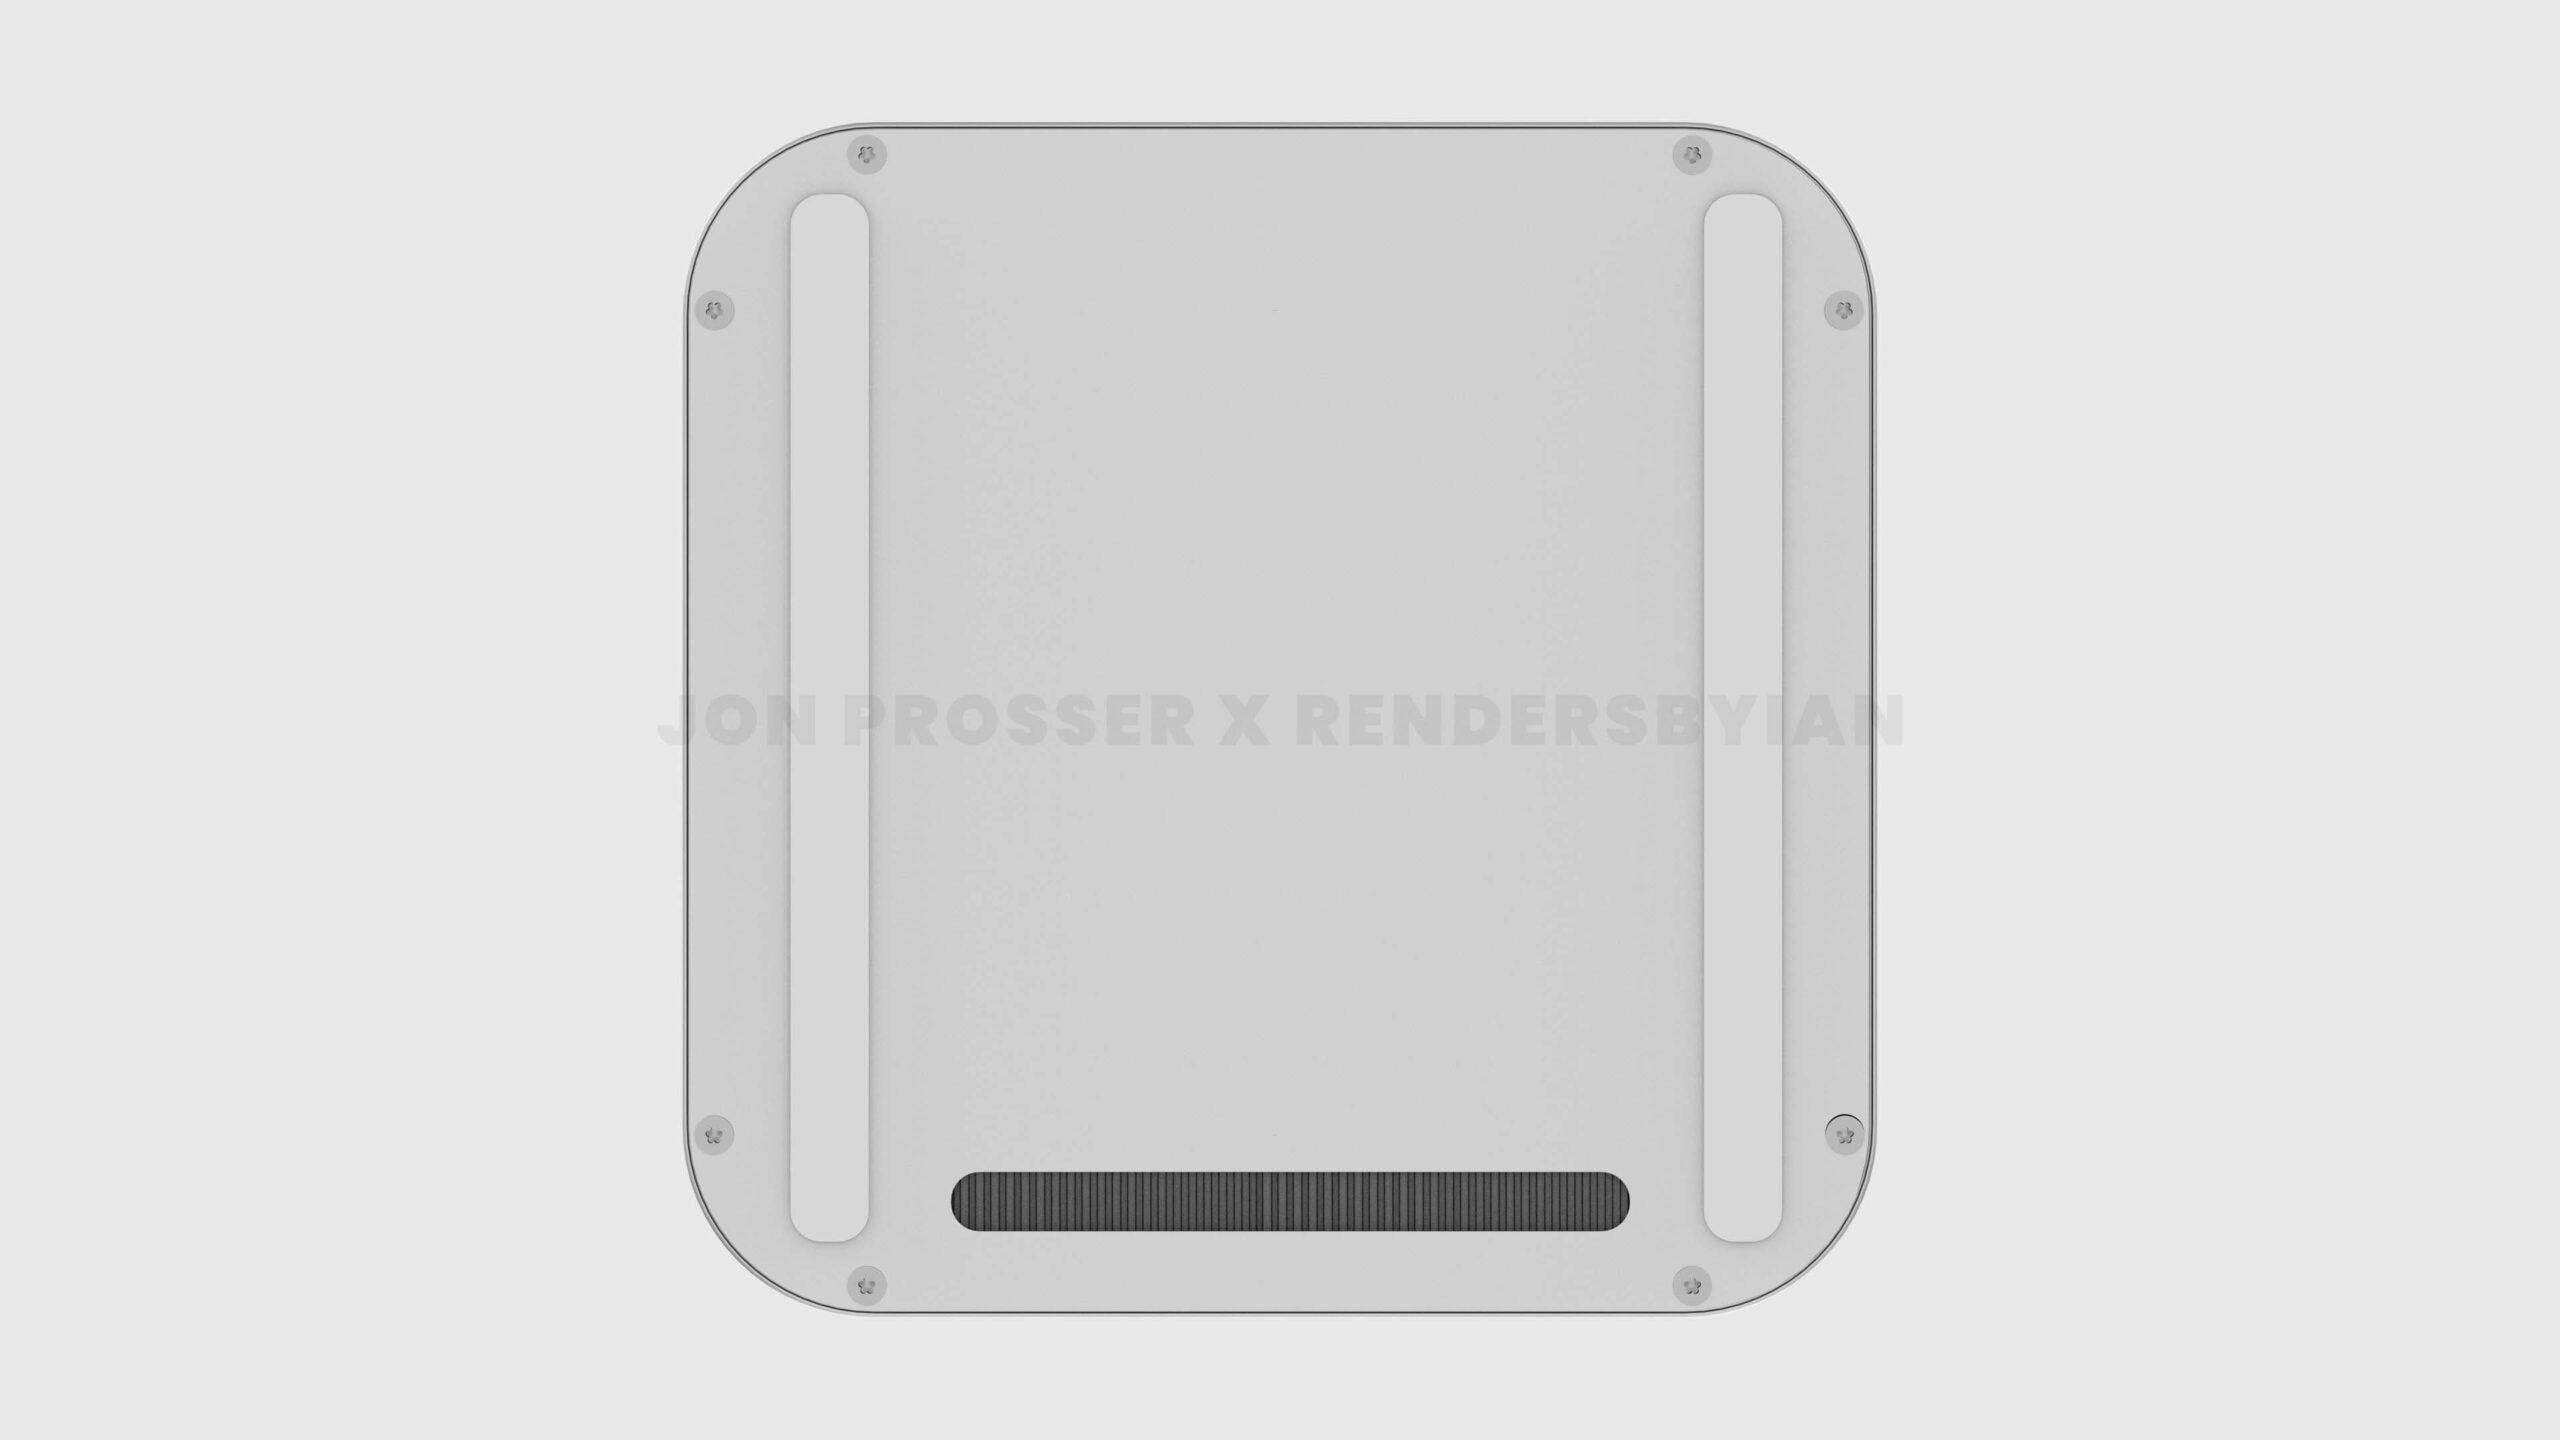 M1X Mac mini 2021規格、設計、處理器、上市時間傳聞整理